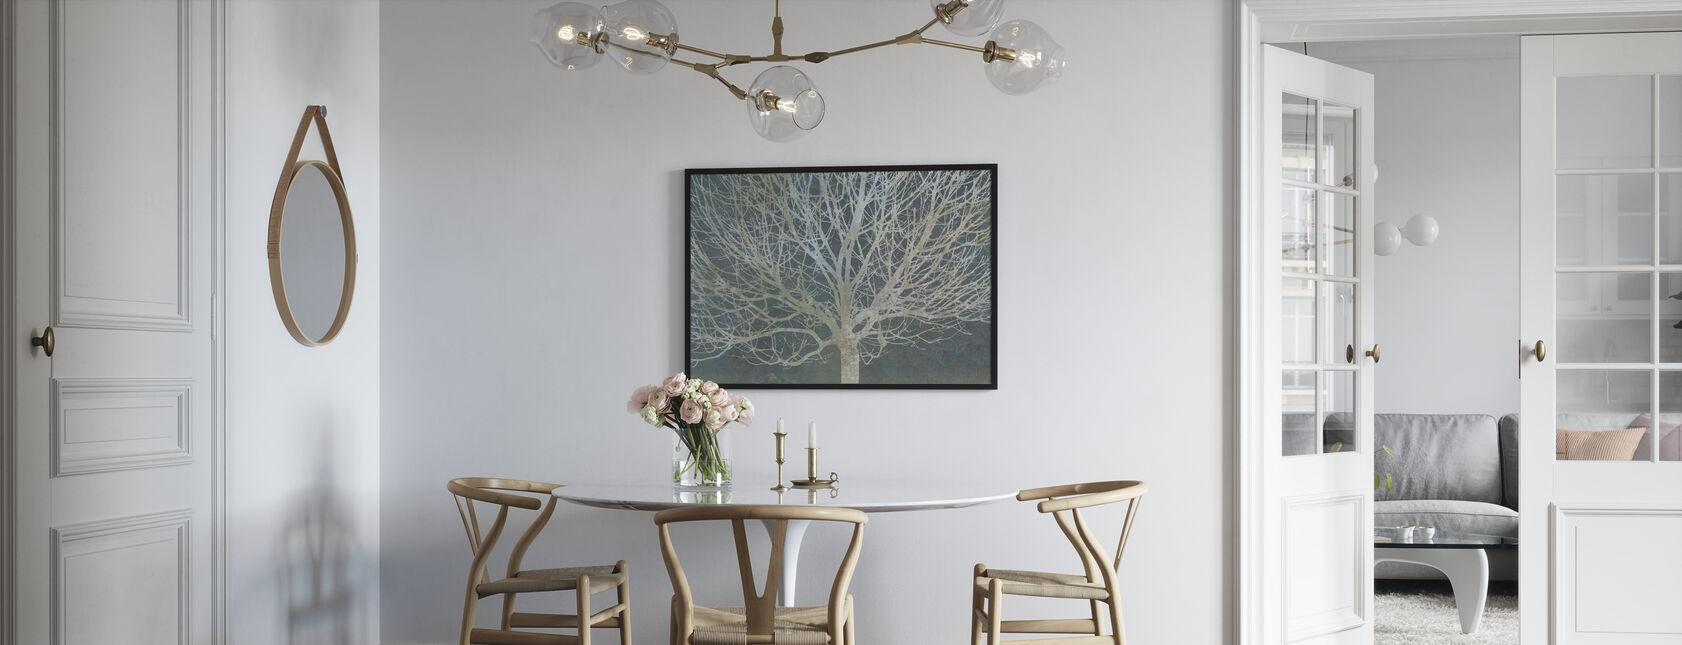 Silverträd - Poster - Kök